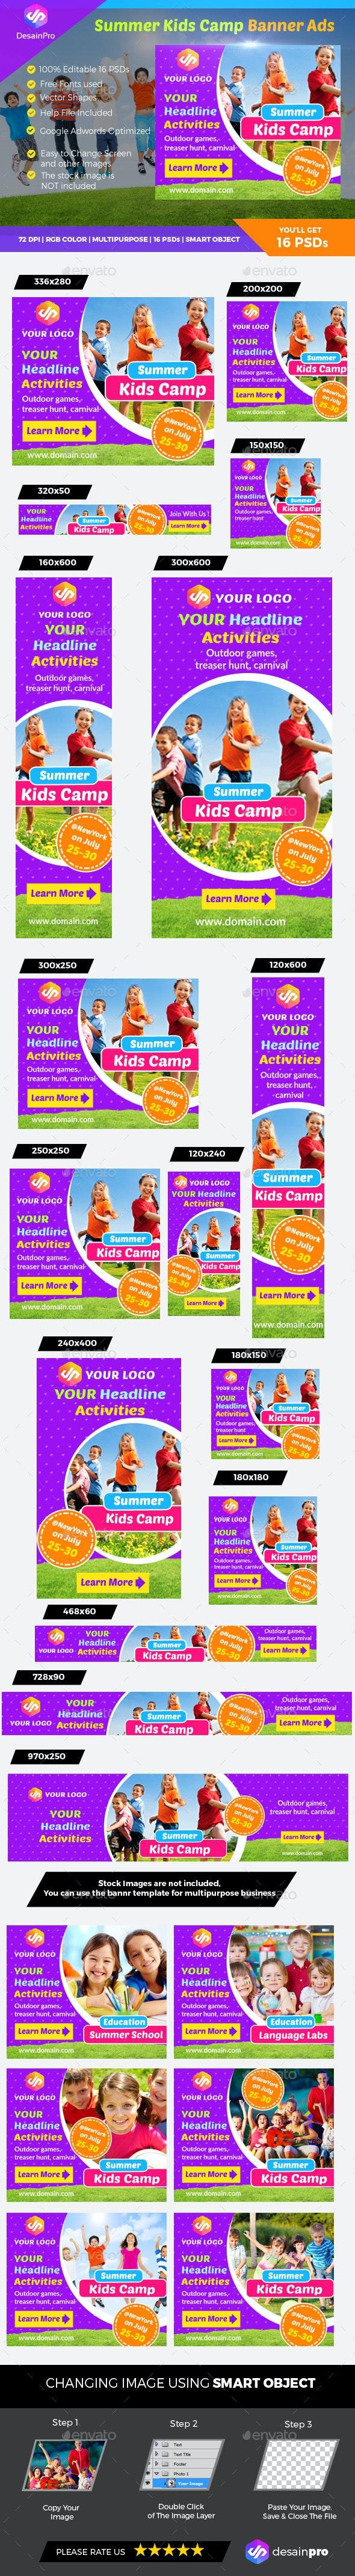 Summer Kids Camp Banner - Banners & Ads Web Elements